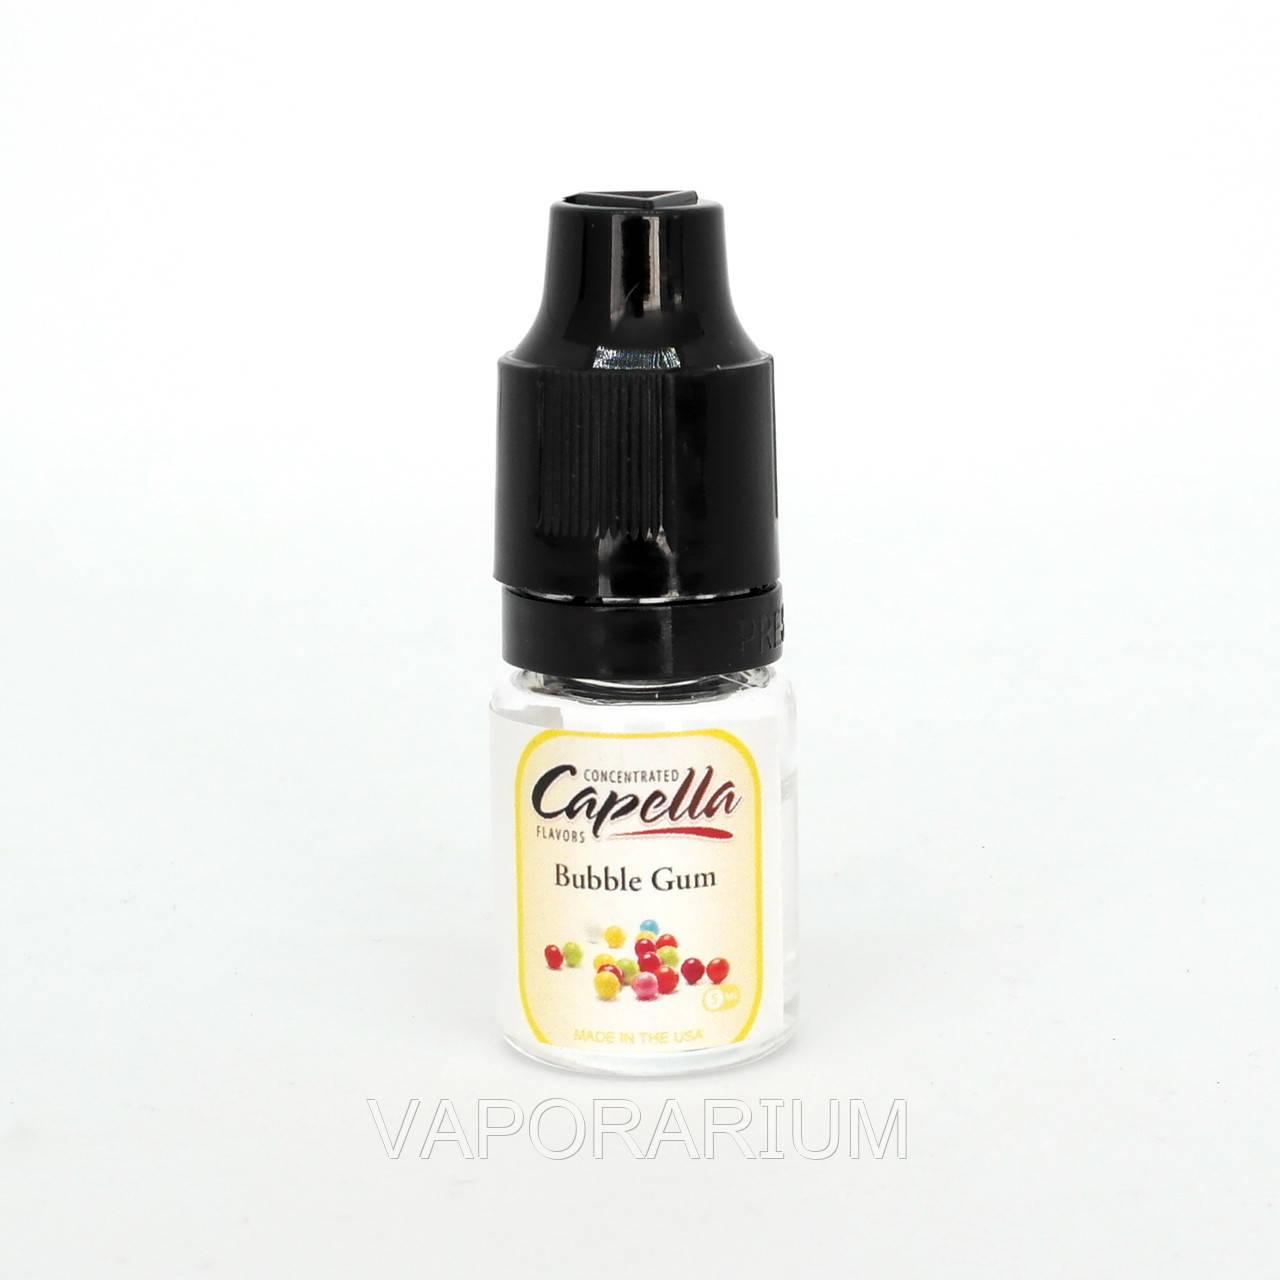 Ароматизатор Capella Bubble Gum (Жевательная резинка) 5 мл. (0204)